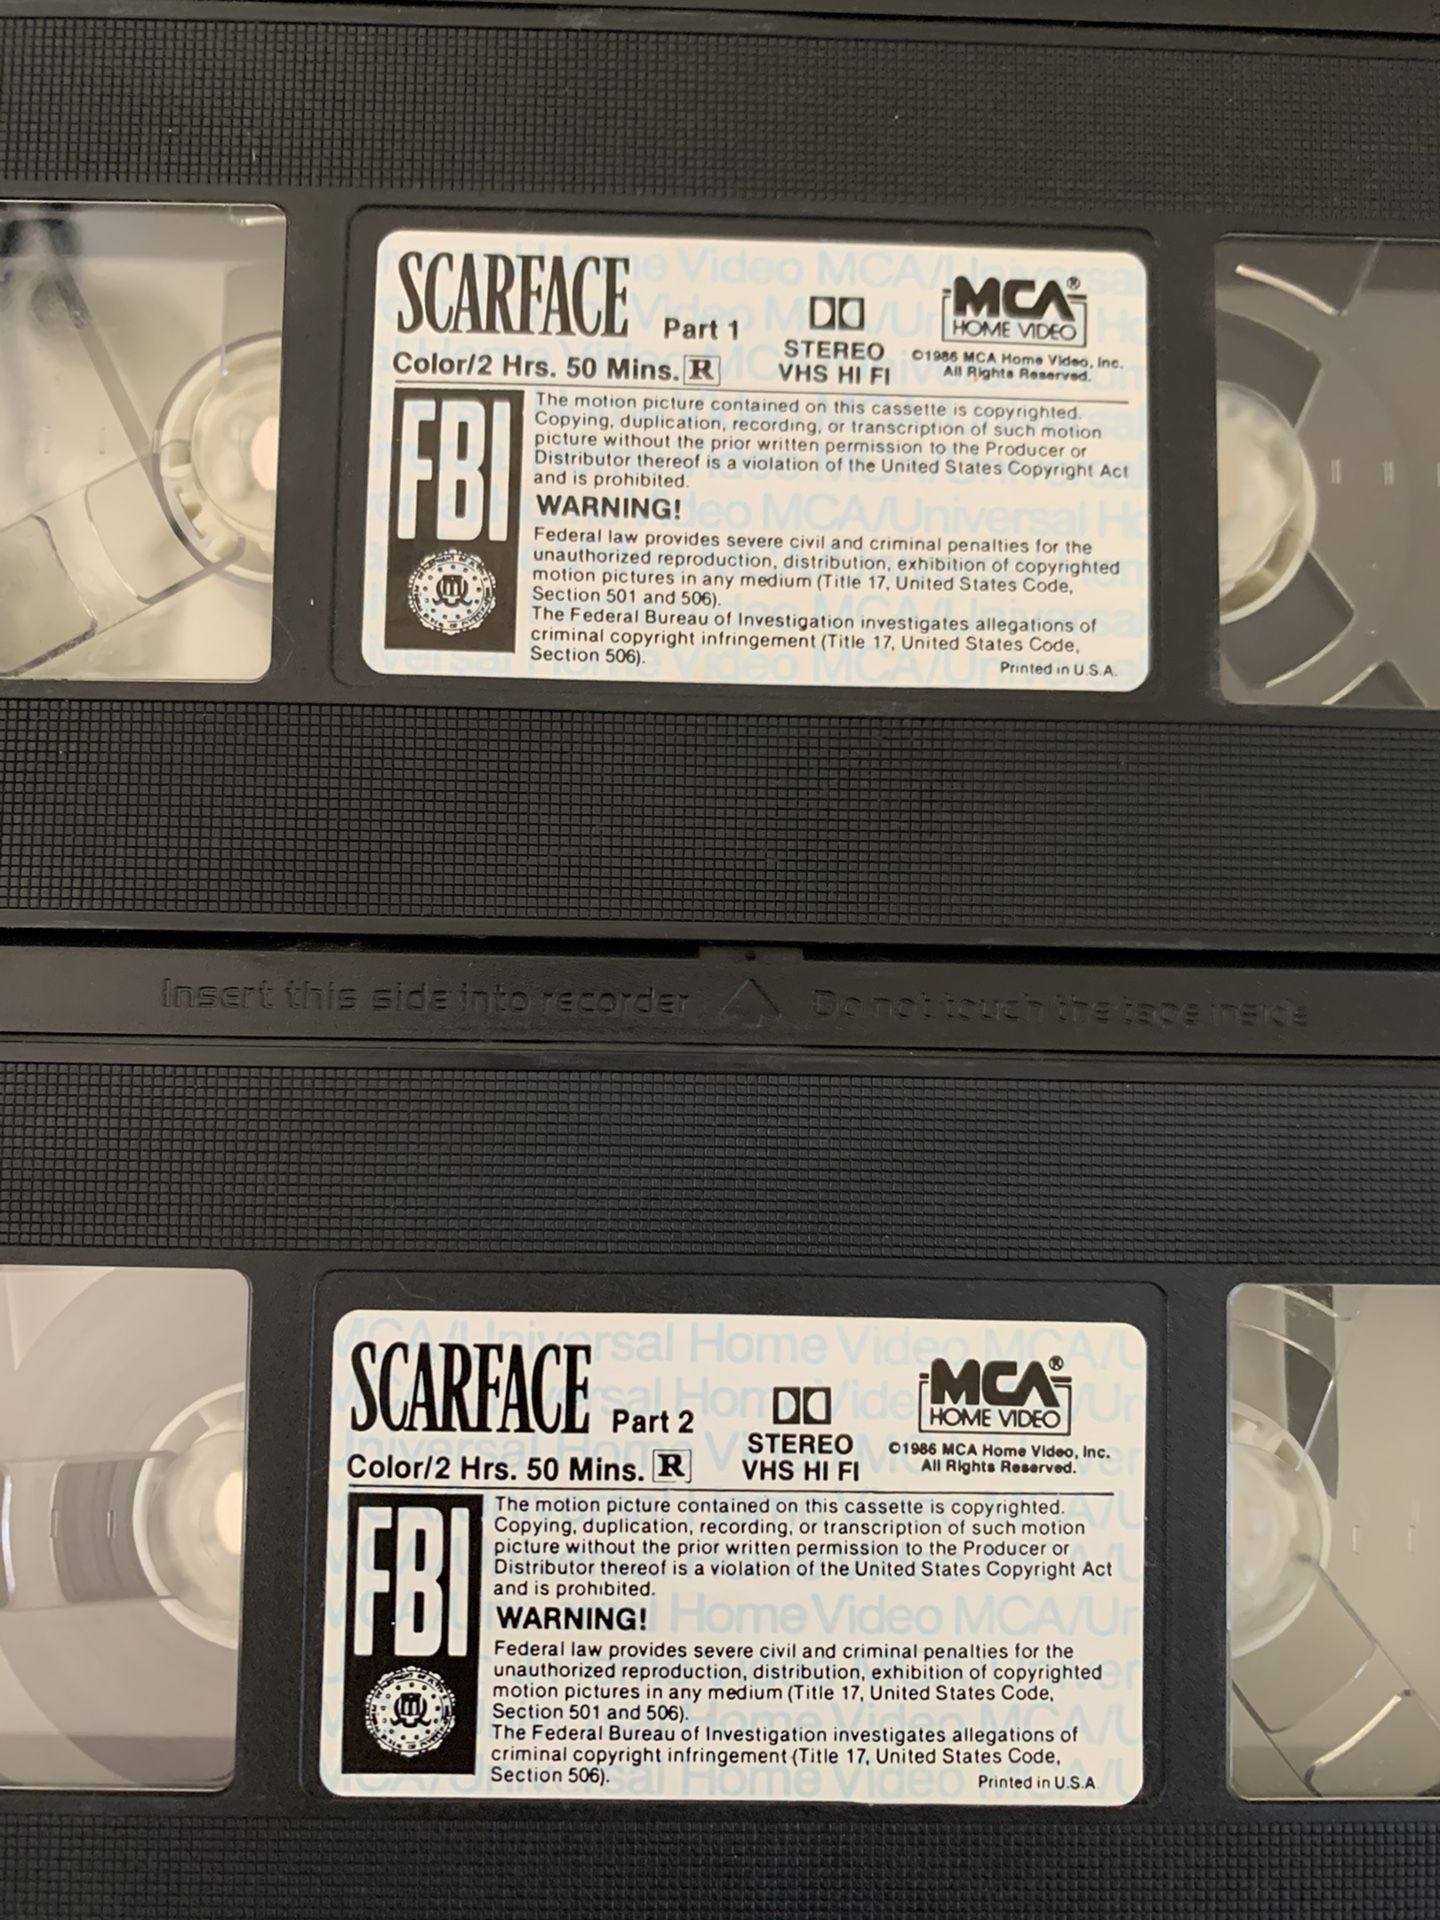 Scarface Box Set VHS Part 1 & 2